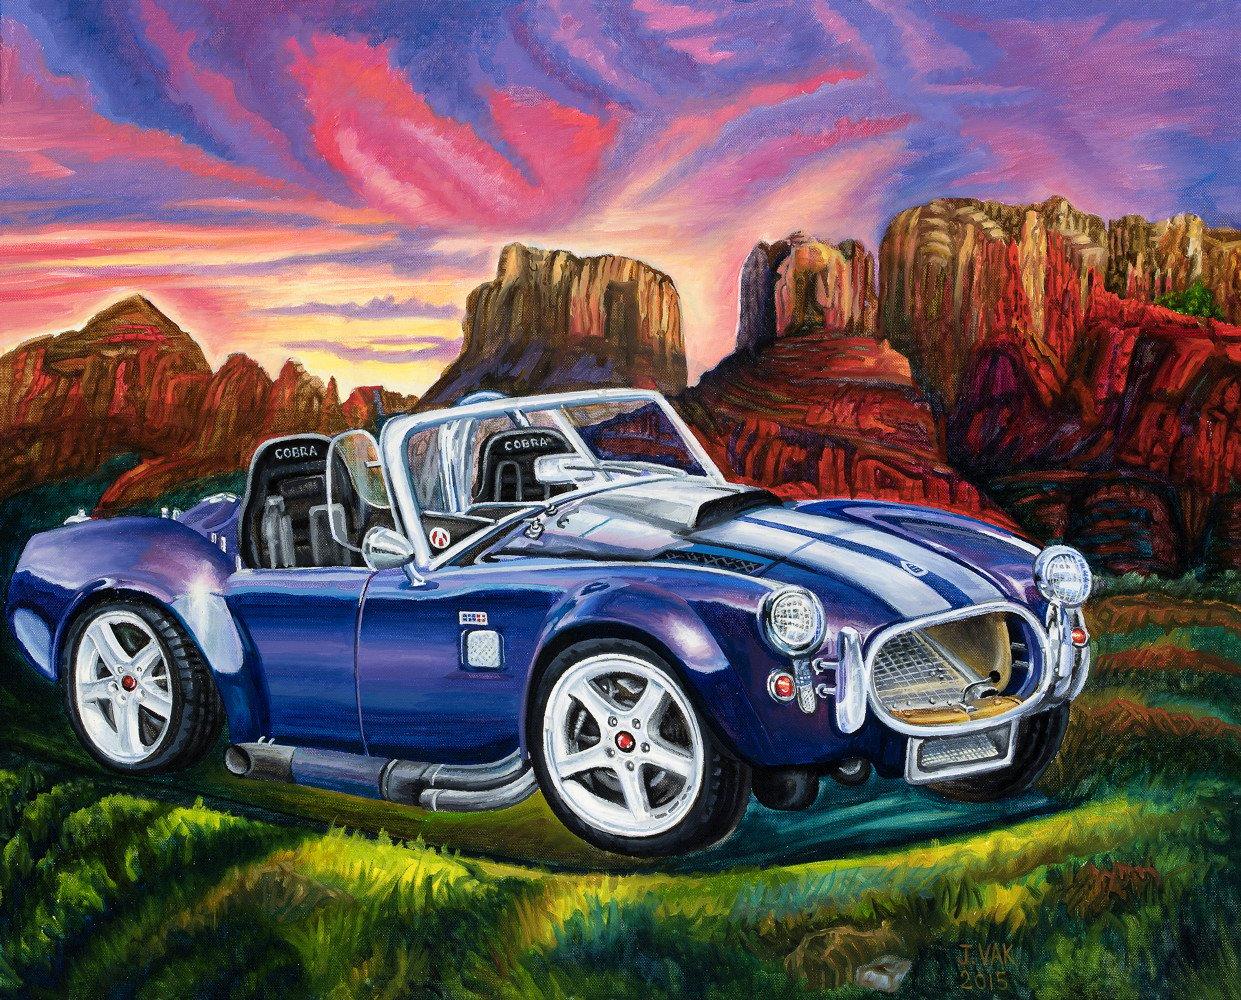 1966 Cobra 24 X 30 Original Oil        $2500         2015